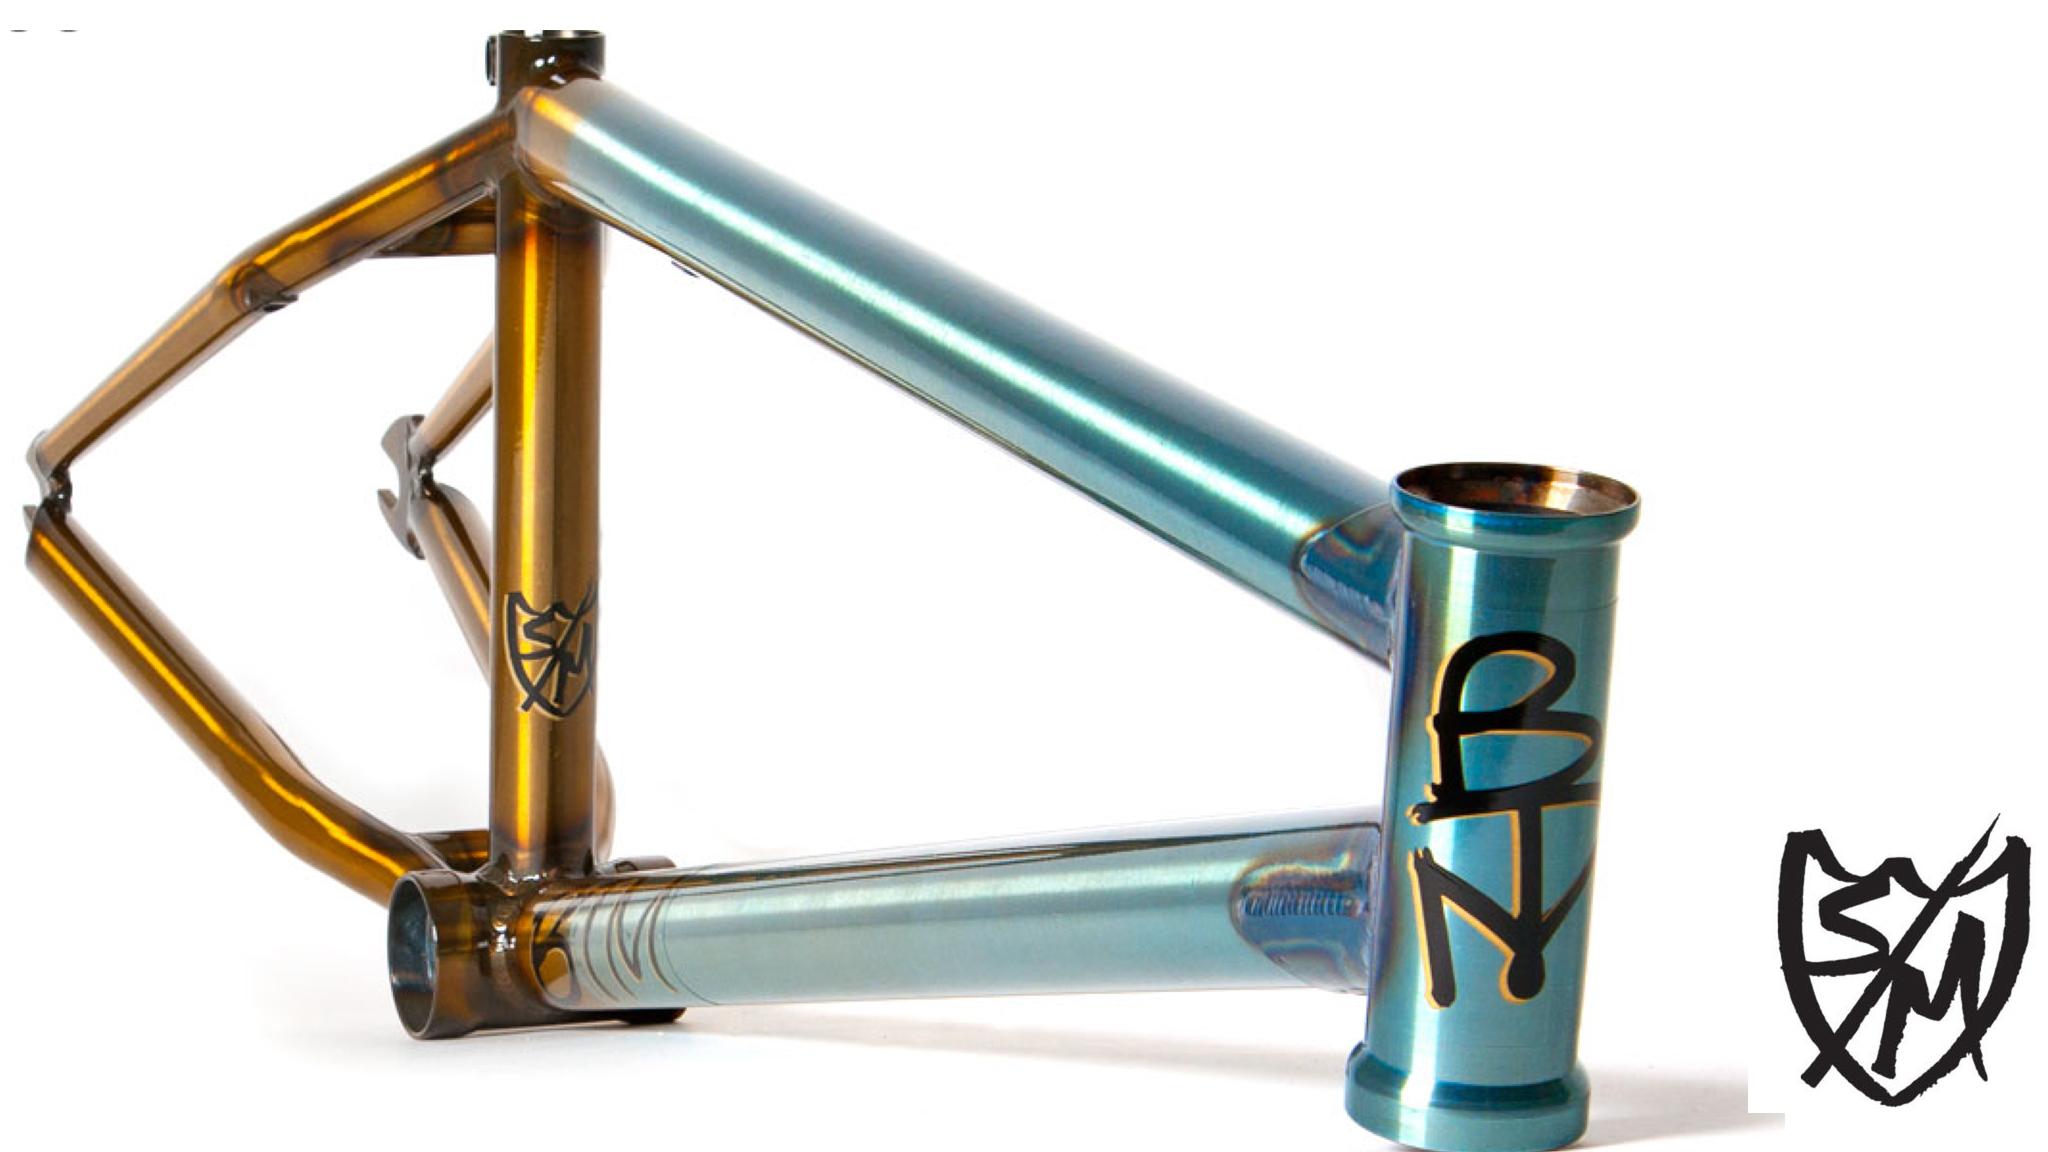 S&M Bikes BTM frame